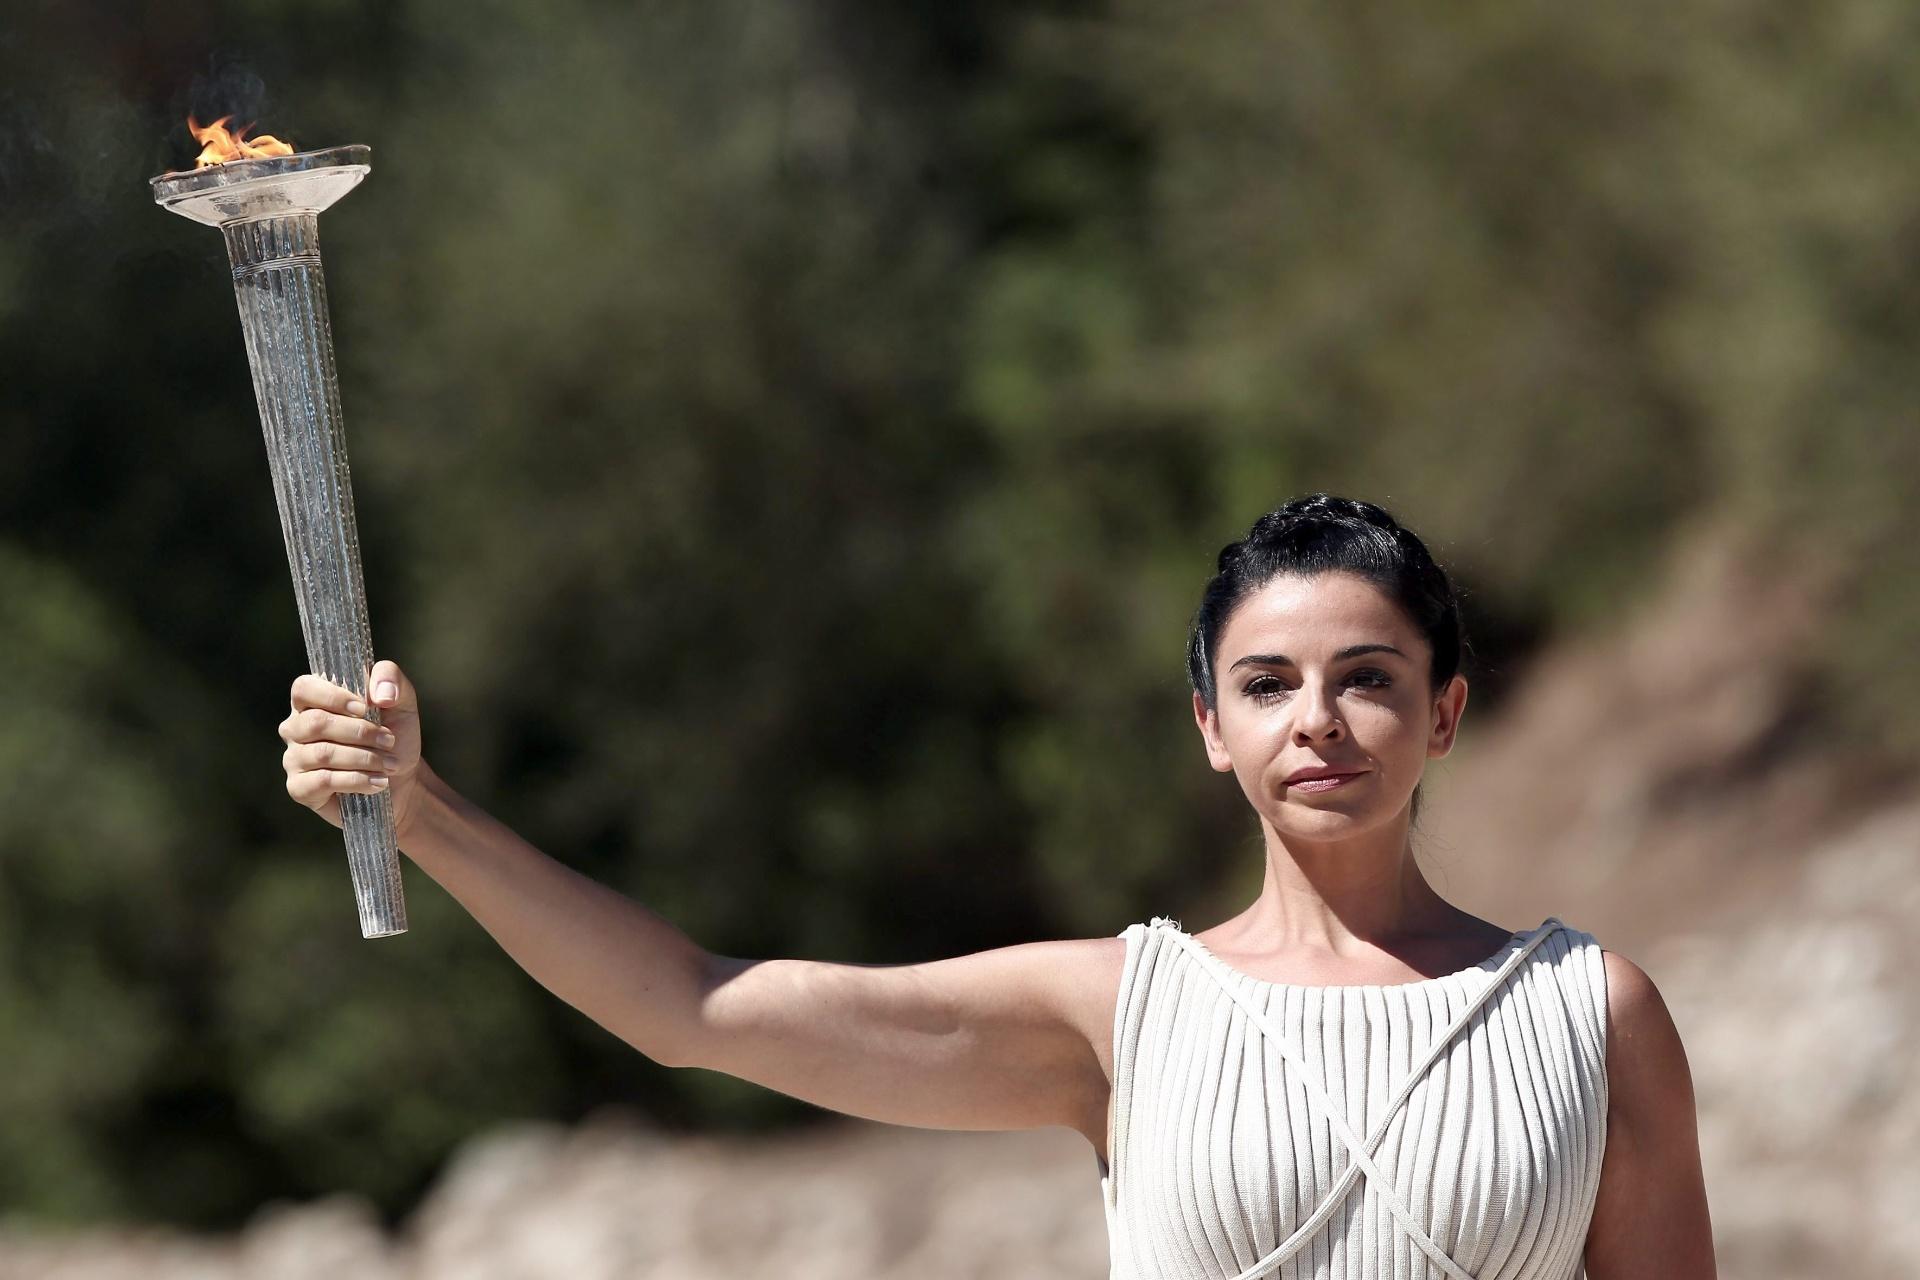 29.set.2013 - A atriz grega, Ino Menegaki, segura a chama olímpica durante a cerimônia ocorrida na Grécia.